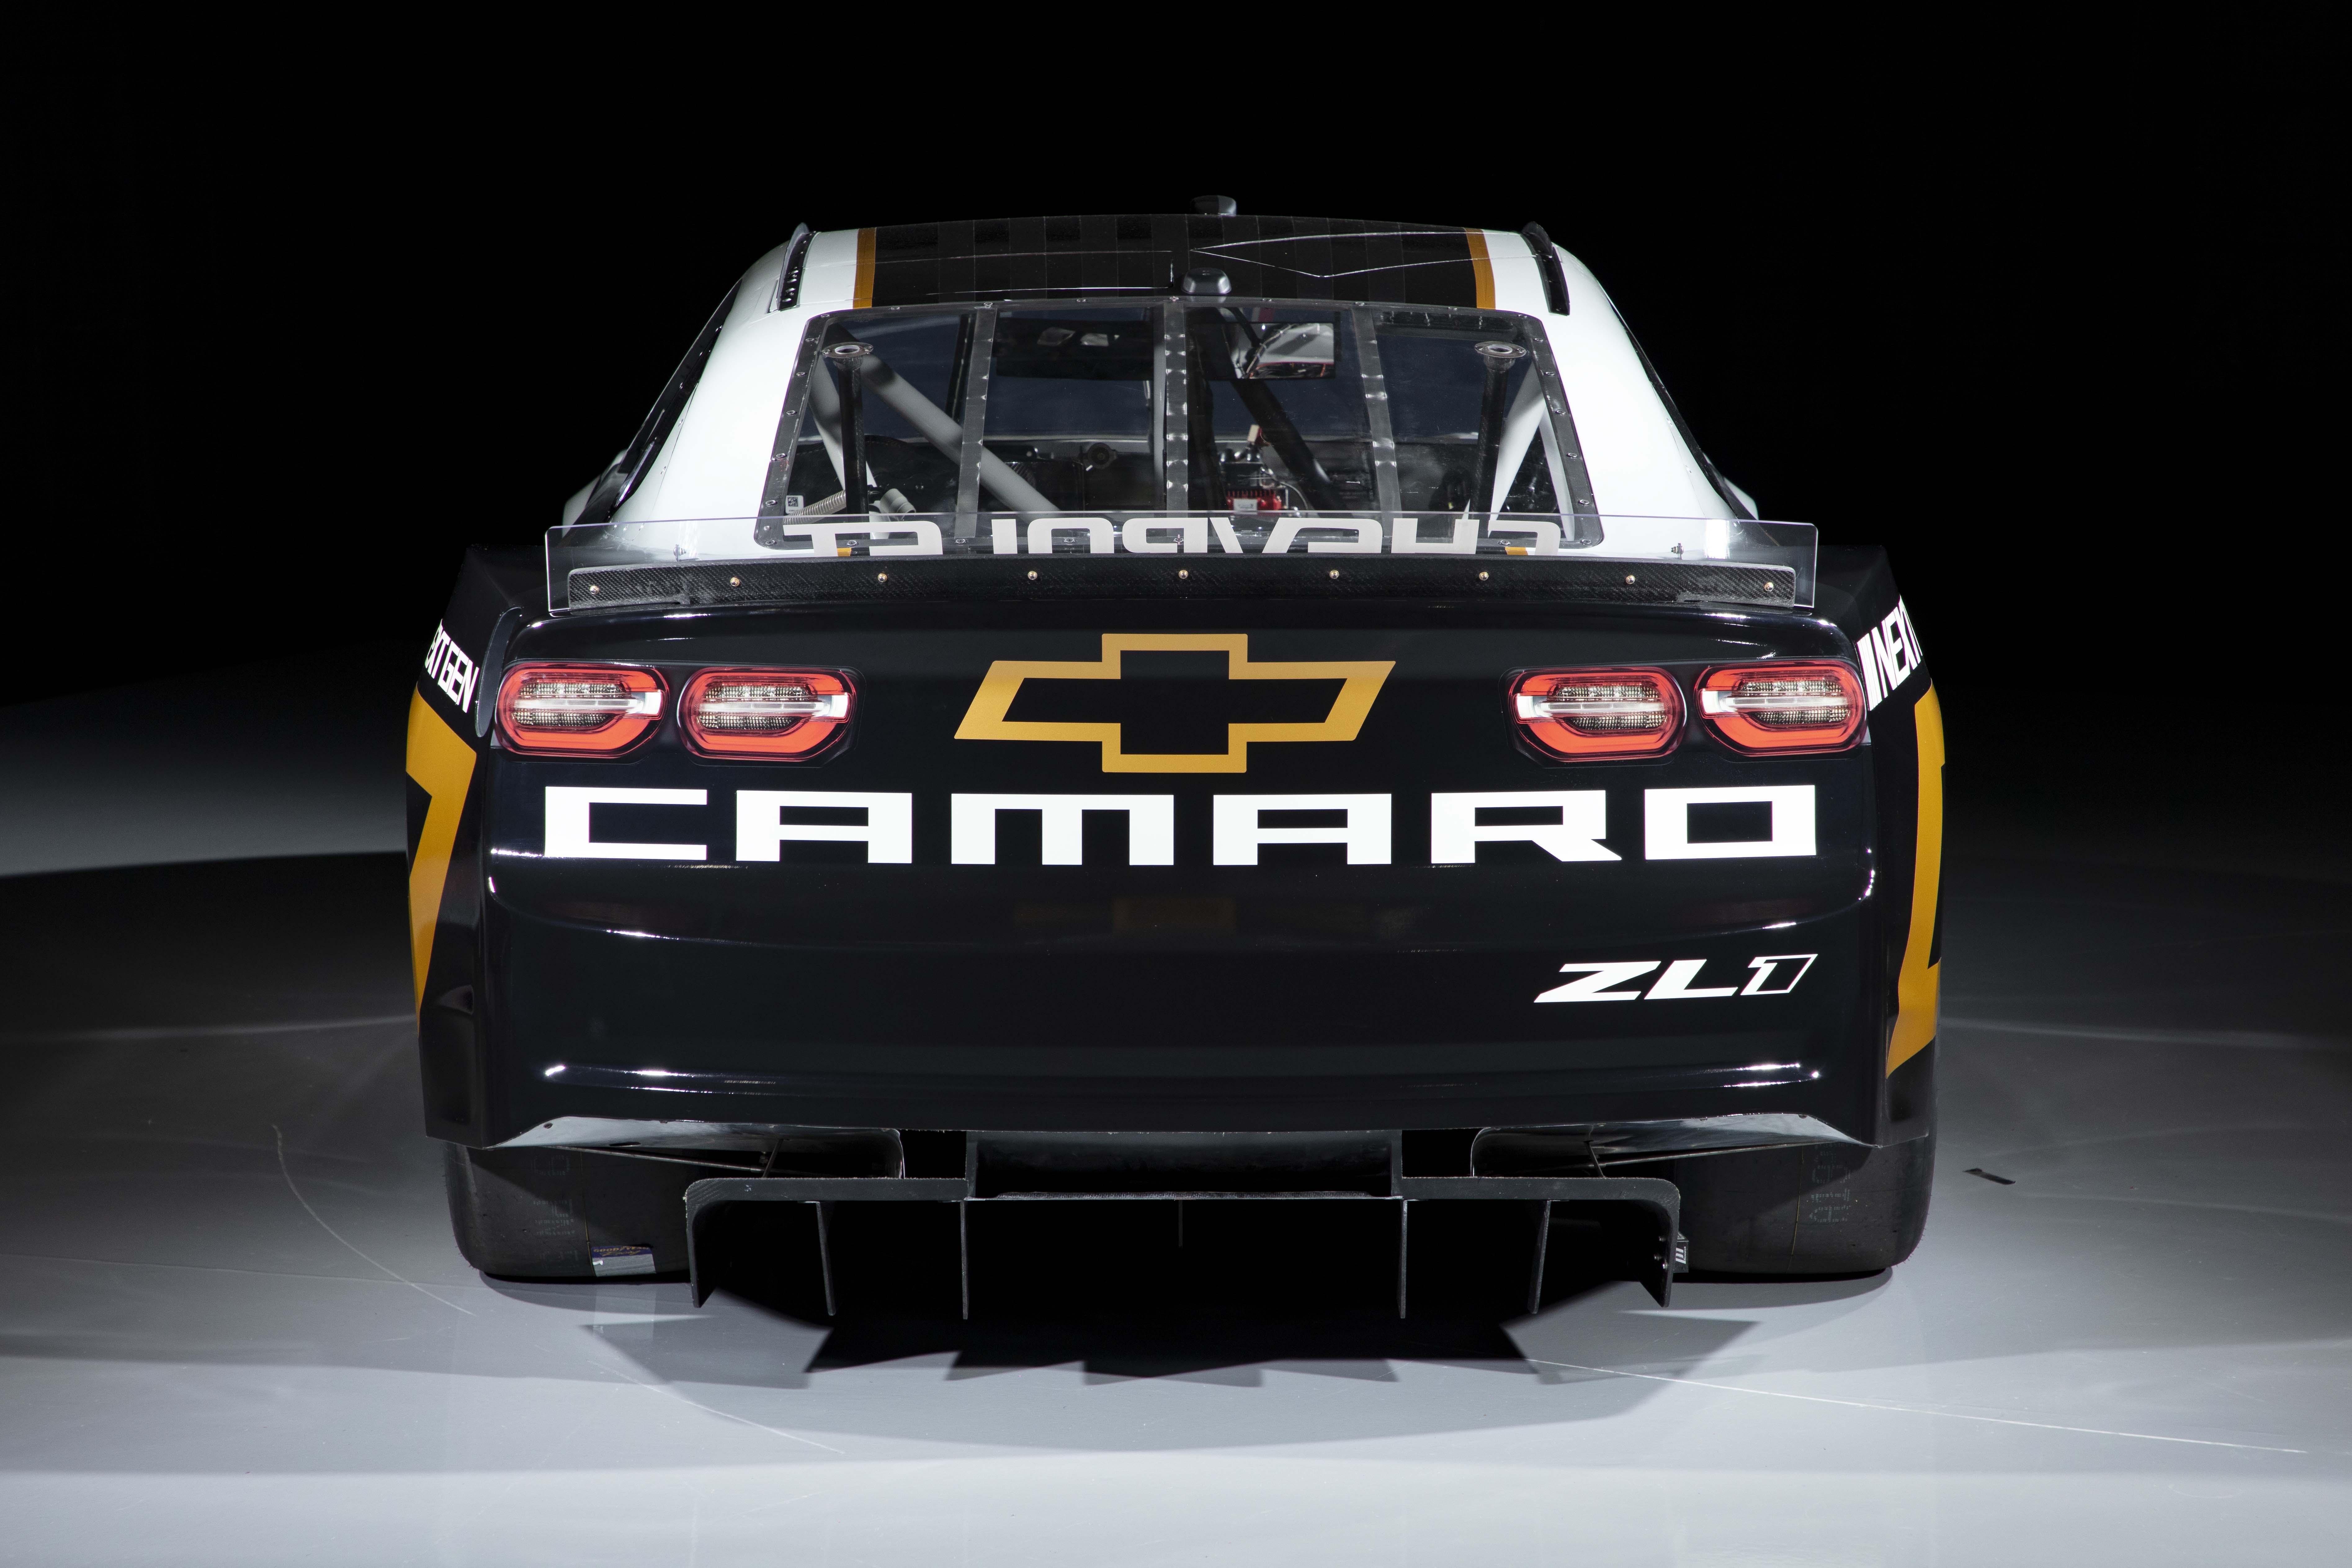 Chevrolet Camaro - 2022 Next Gen Car - Rear Photo